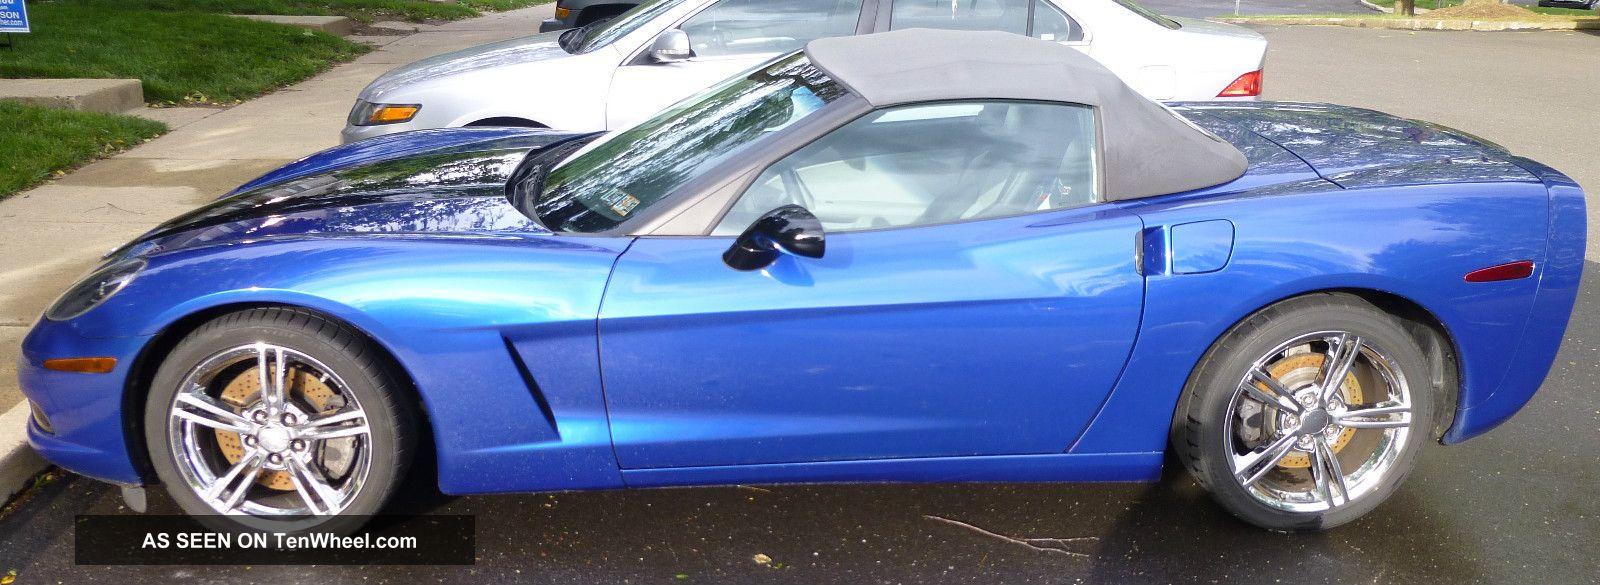 2008 Chevy Corvette Convertible Corvette photo